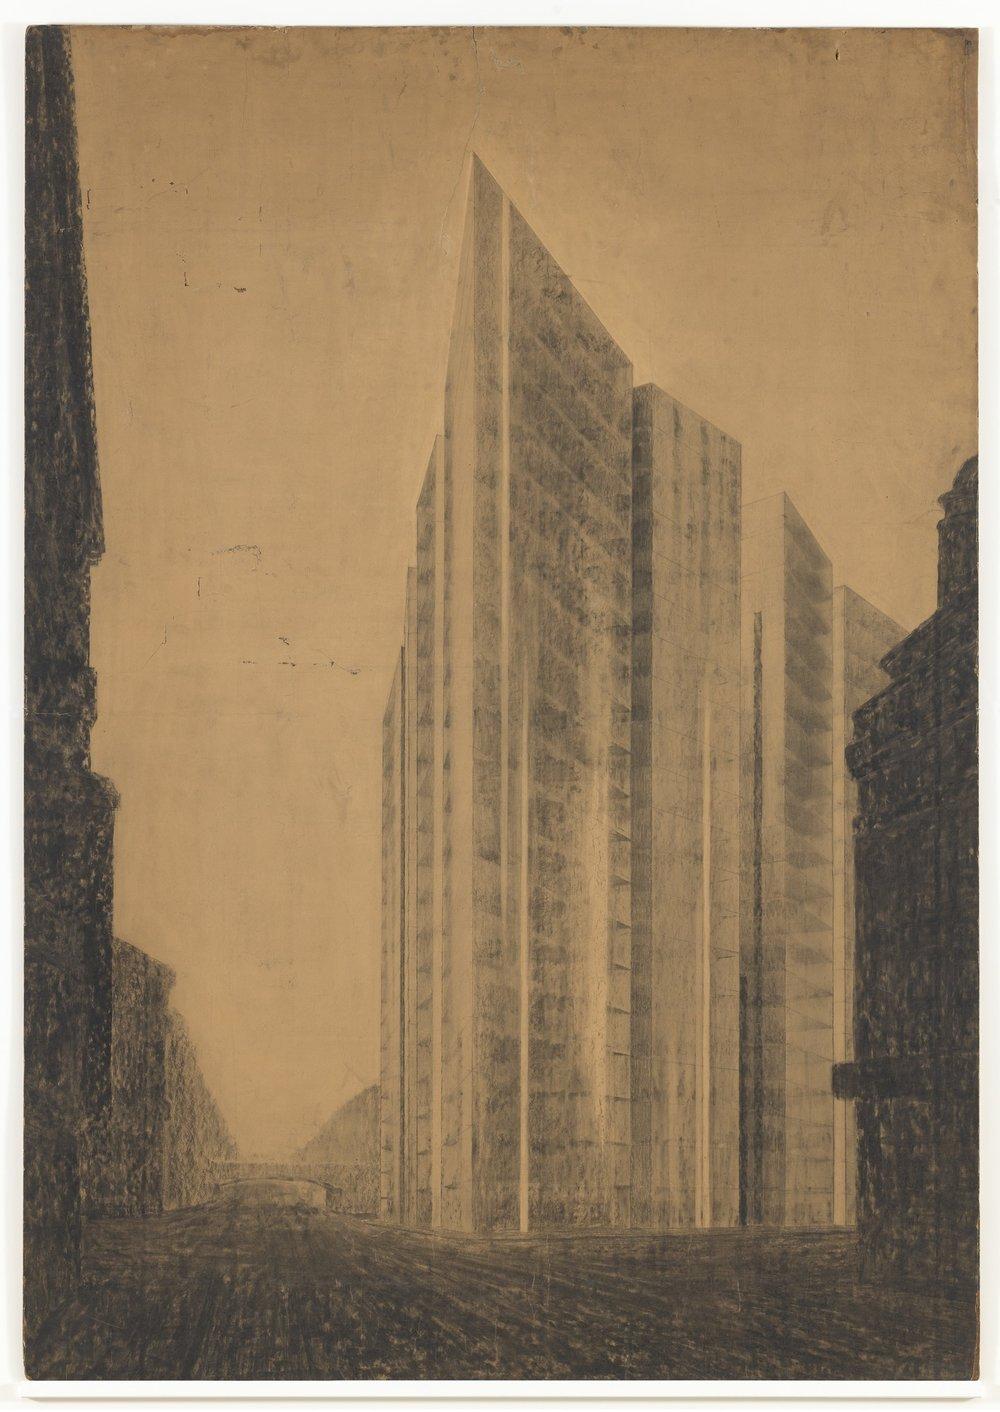 Ludwig Mies van der Rohe, Friedrichstrasse Skyscraper Project, Berlin-Mitte, Germany (1921)